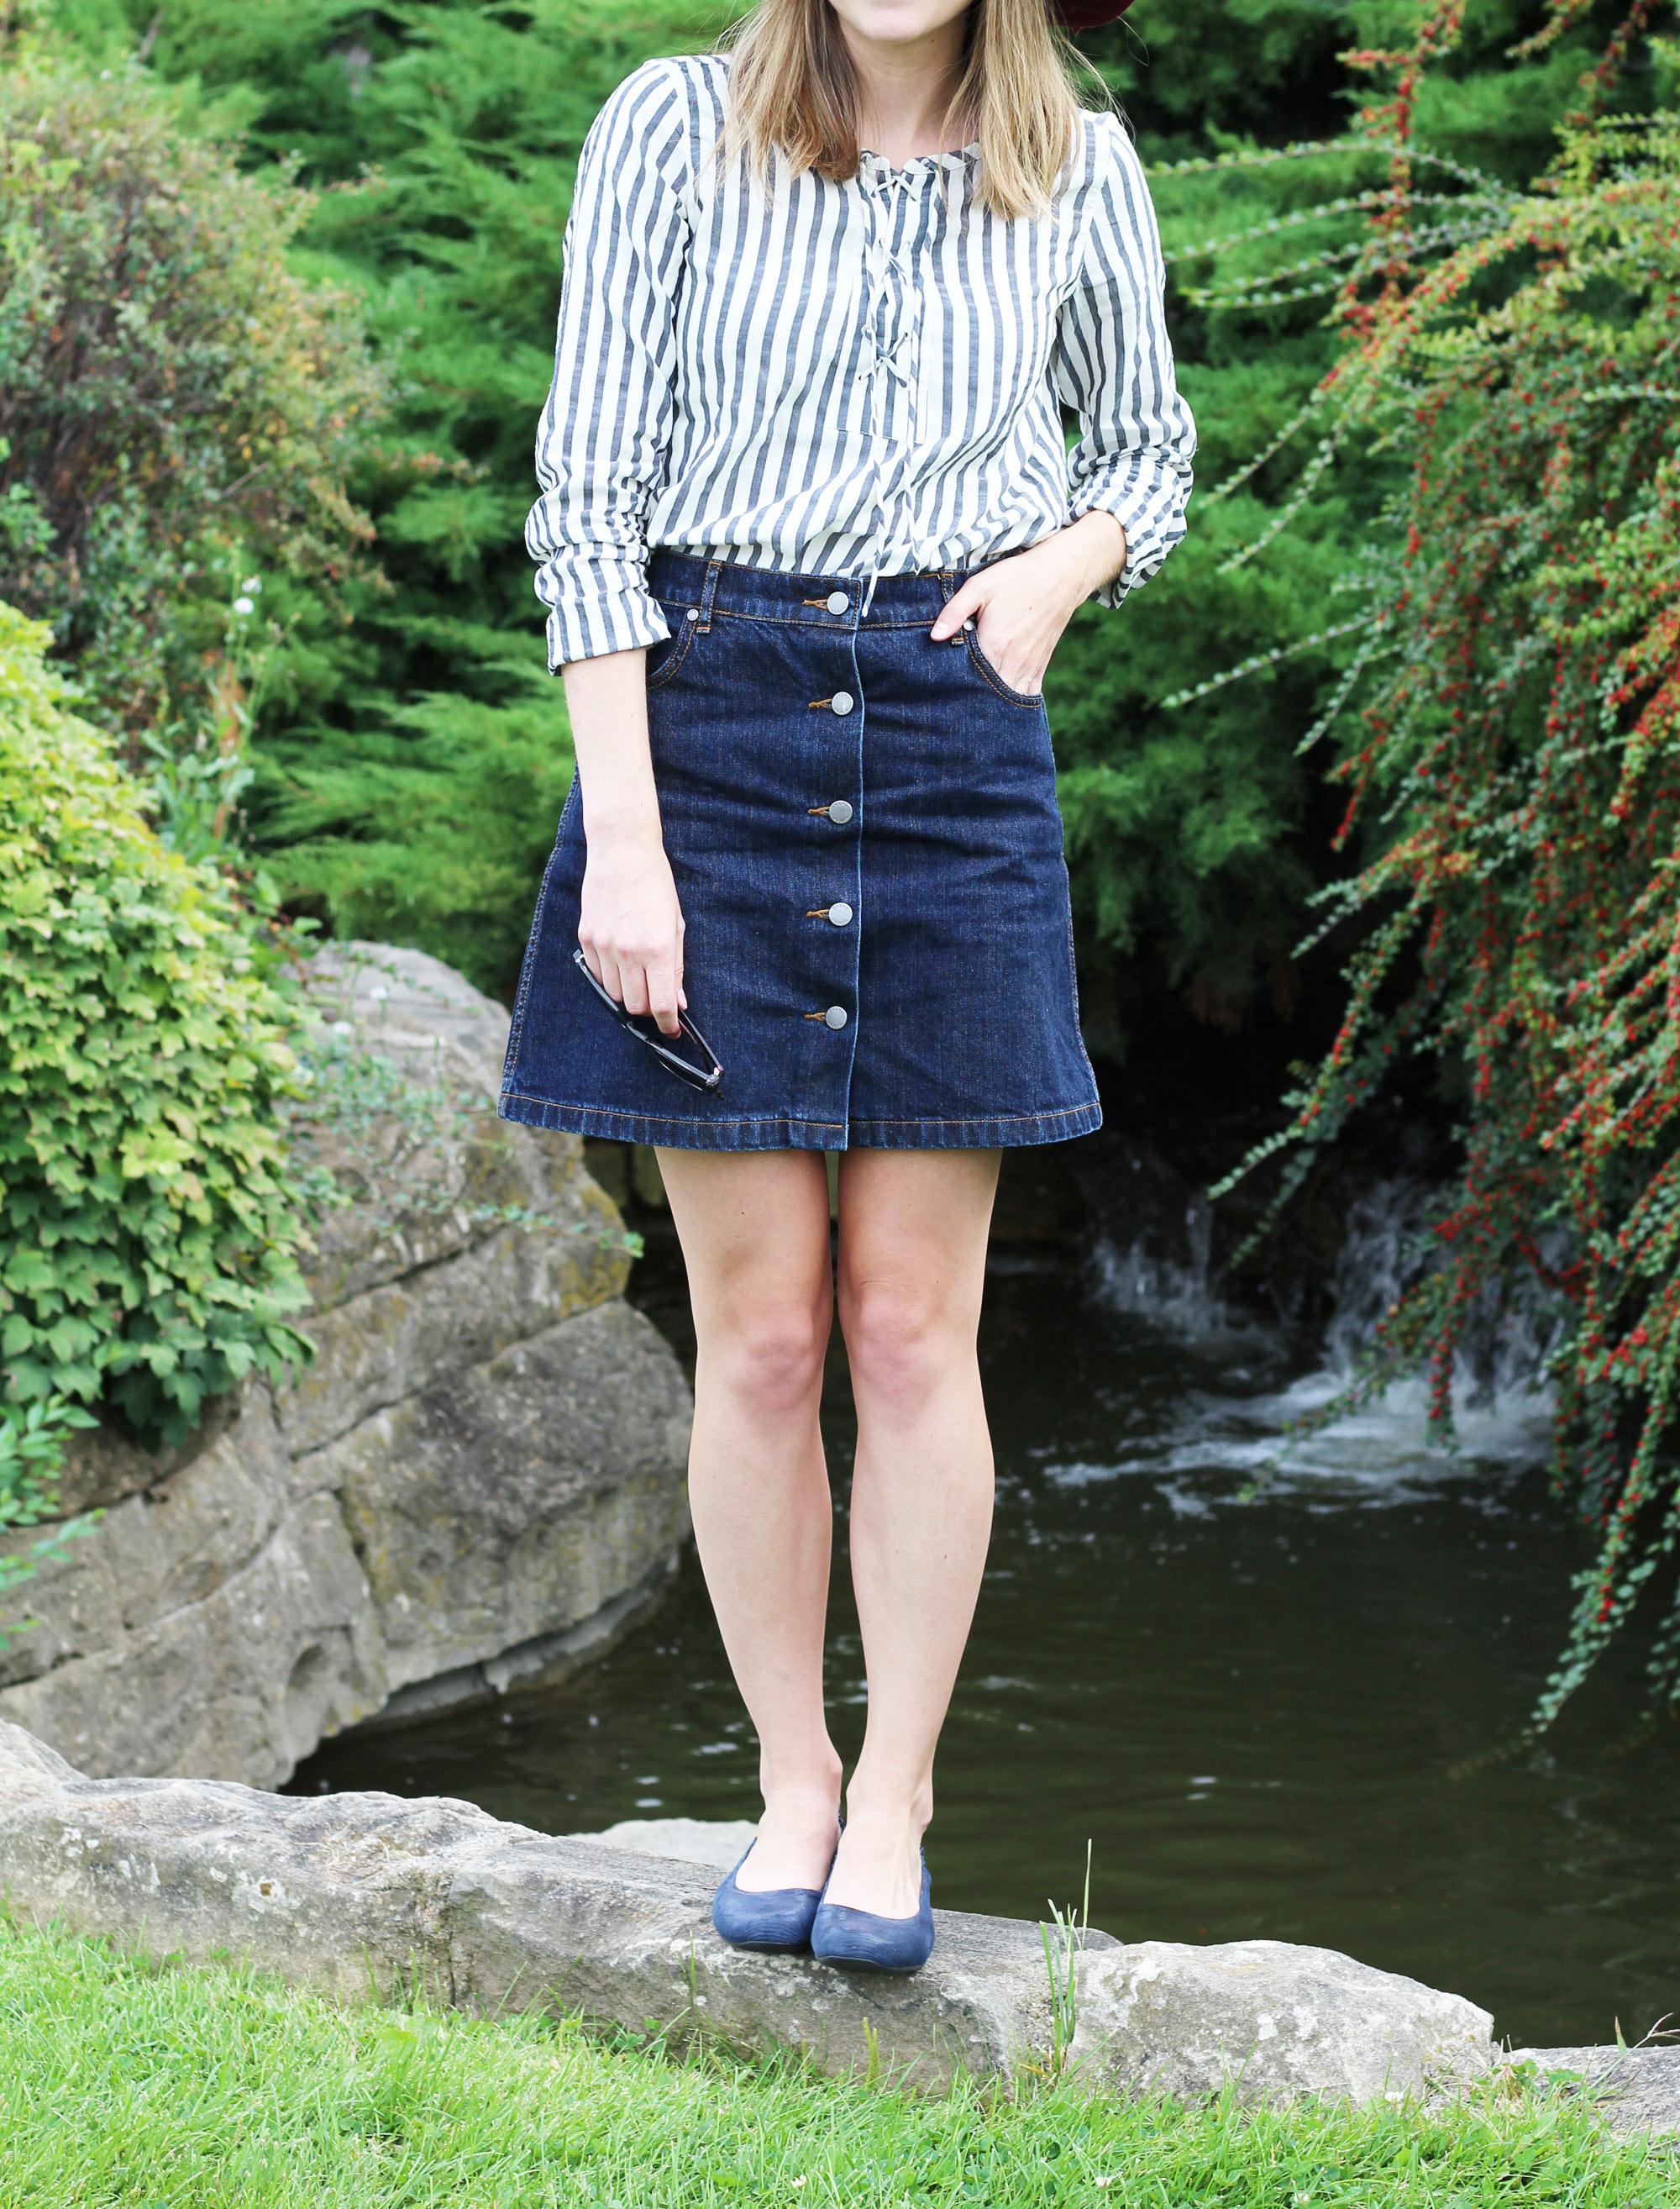 Earthies navy 'Tolo' flats + striped lace-up blouse + denim skirt — Cotton Cashmere Cat Hair